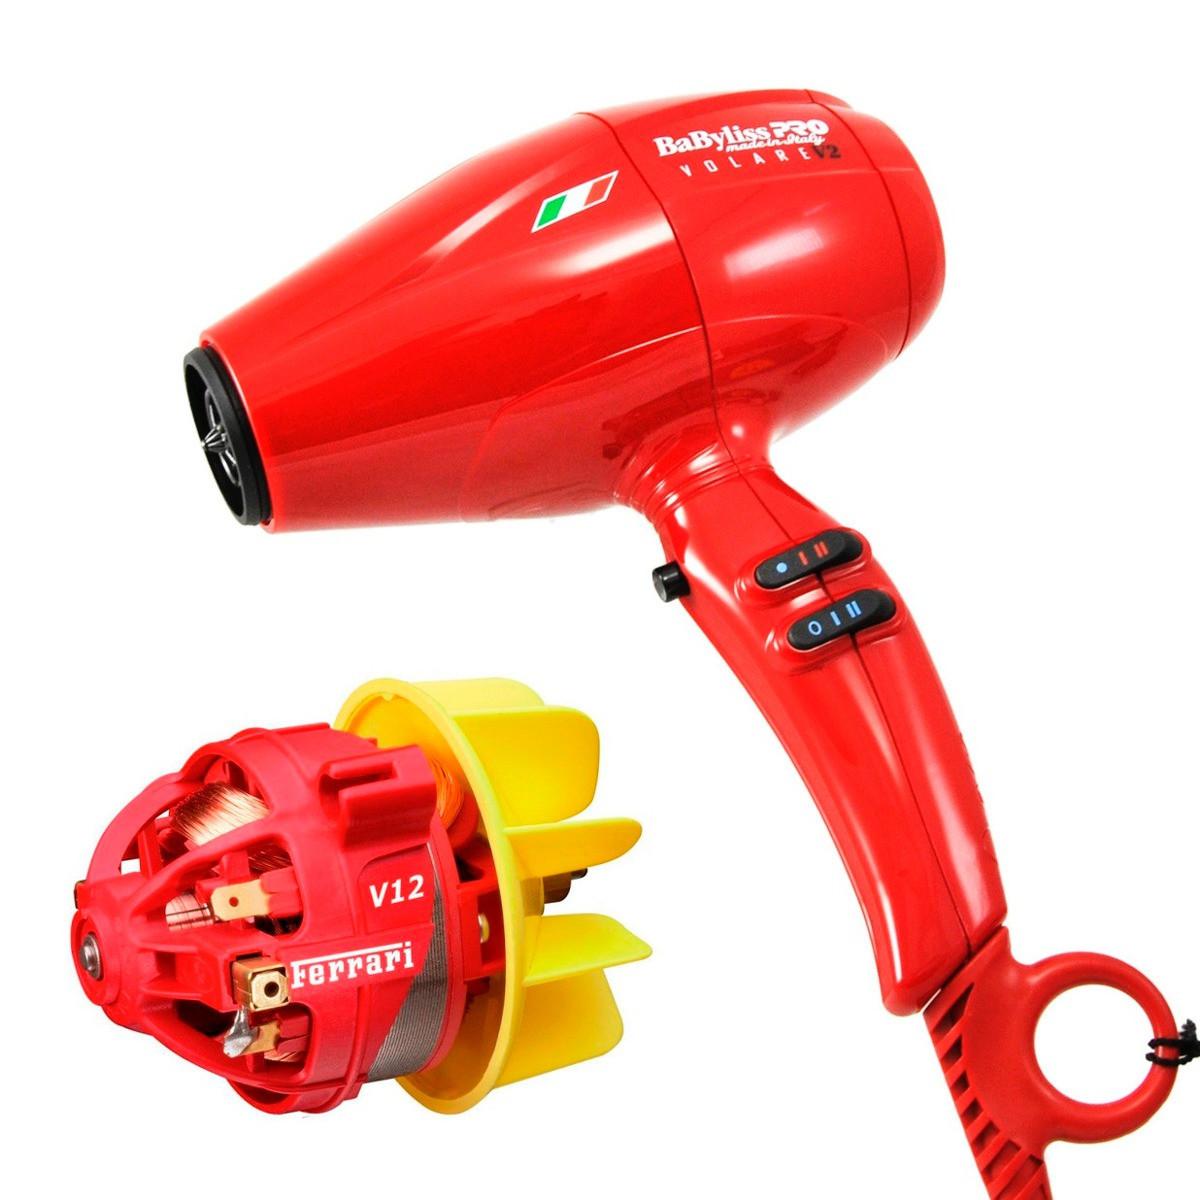 motor zoom pelo products volare ferrari loading de pro profesional secador babyliss con